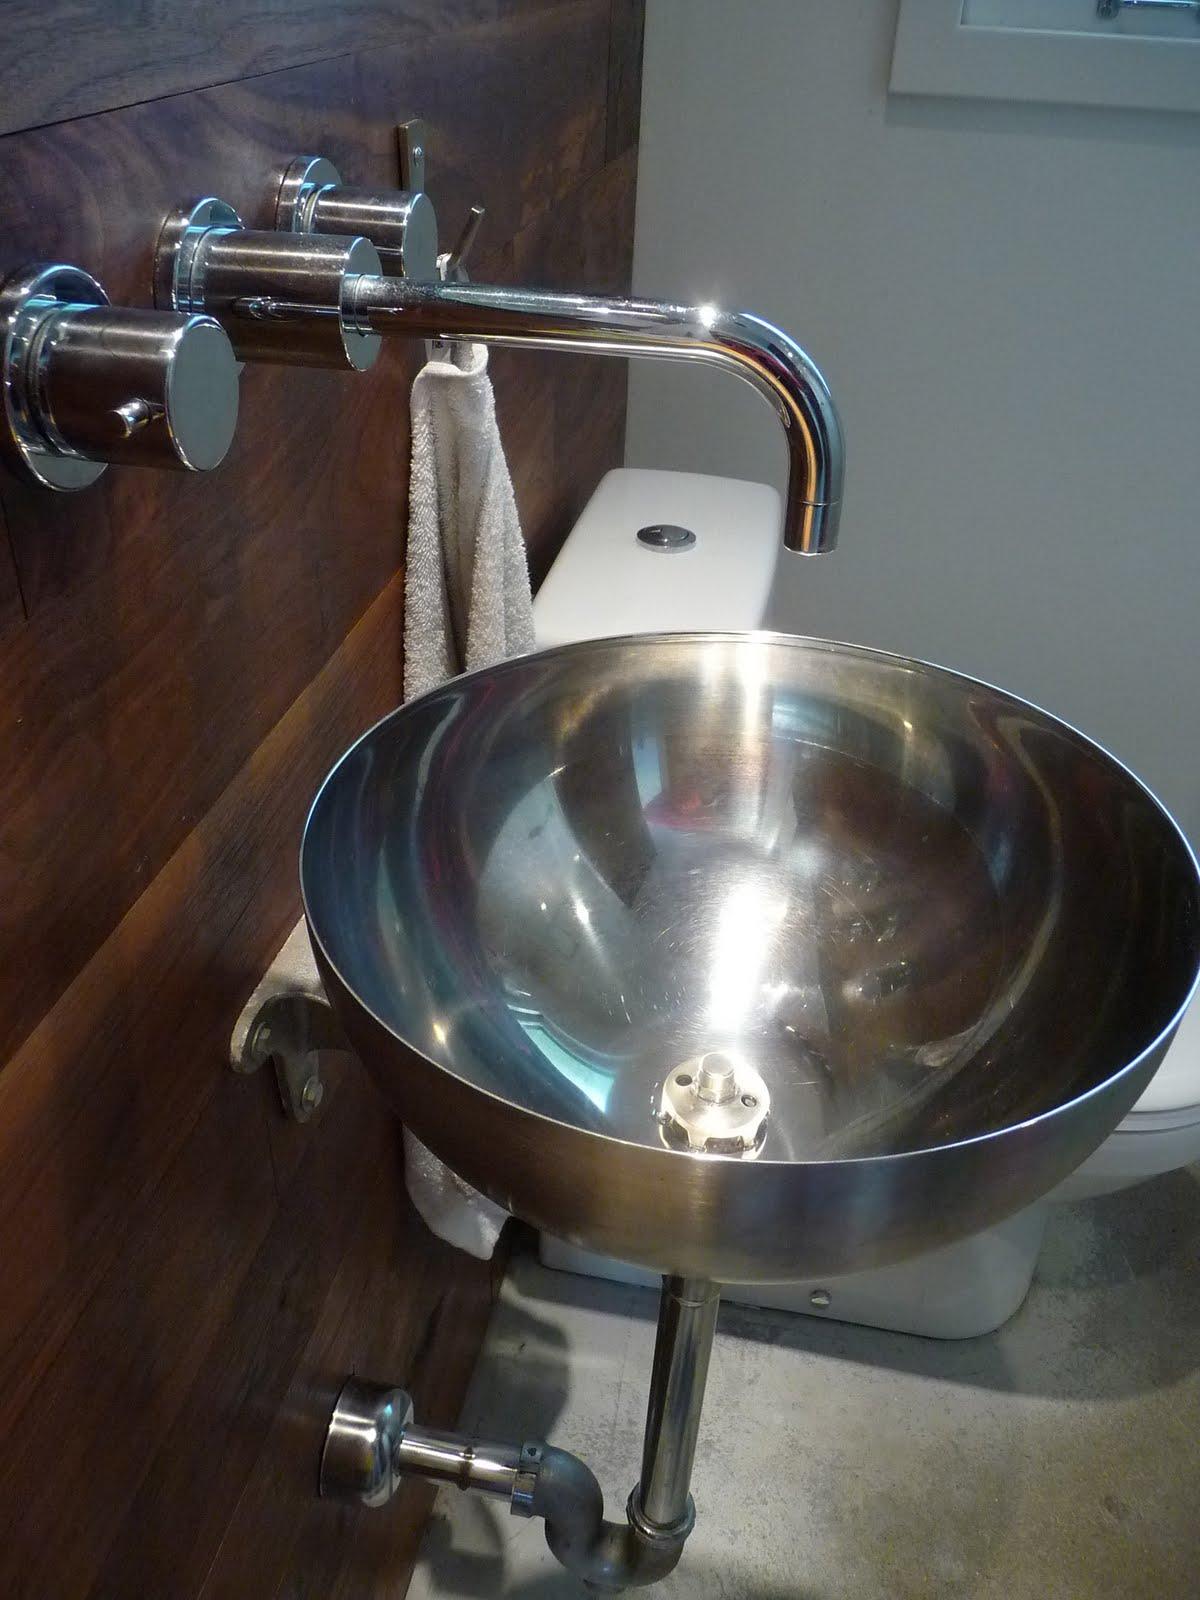 Best IKEA salad bowl sink